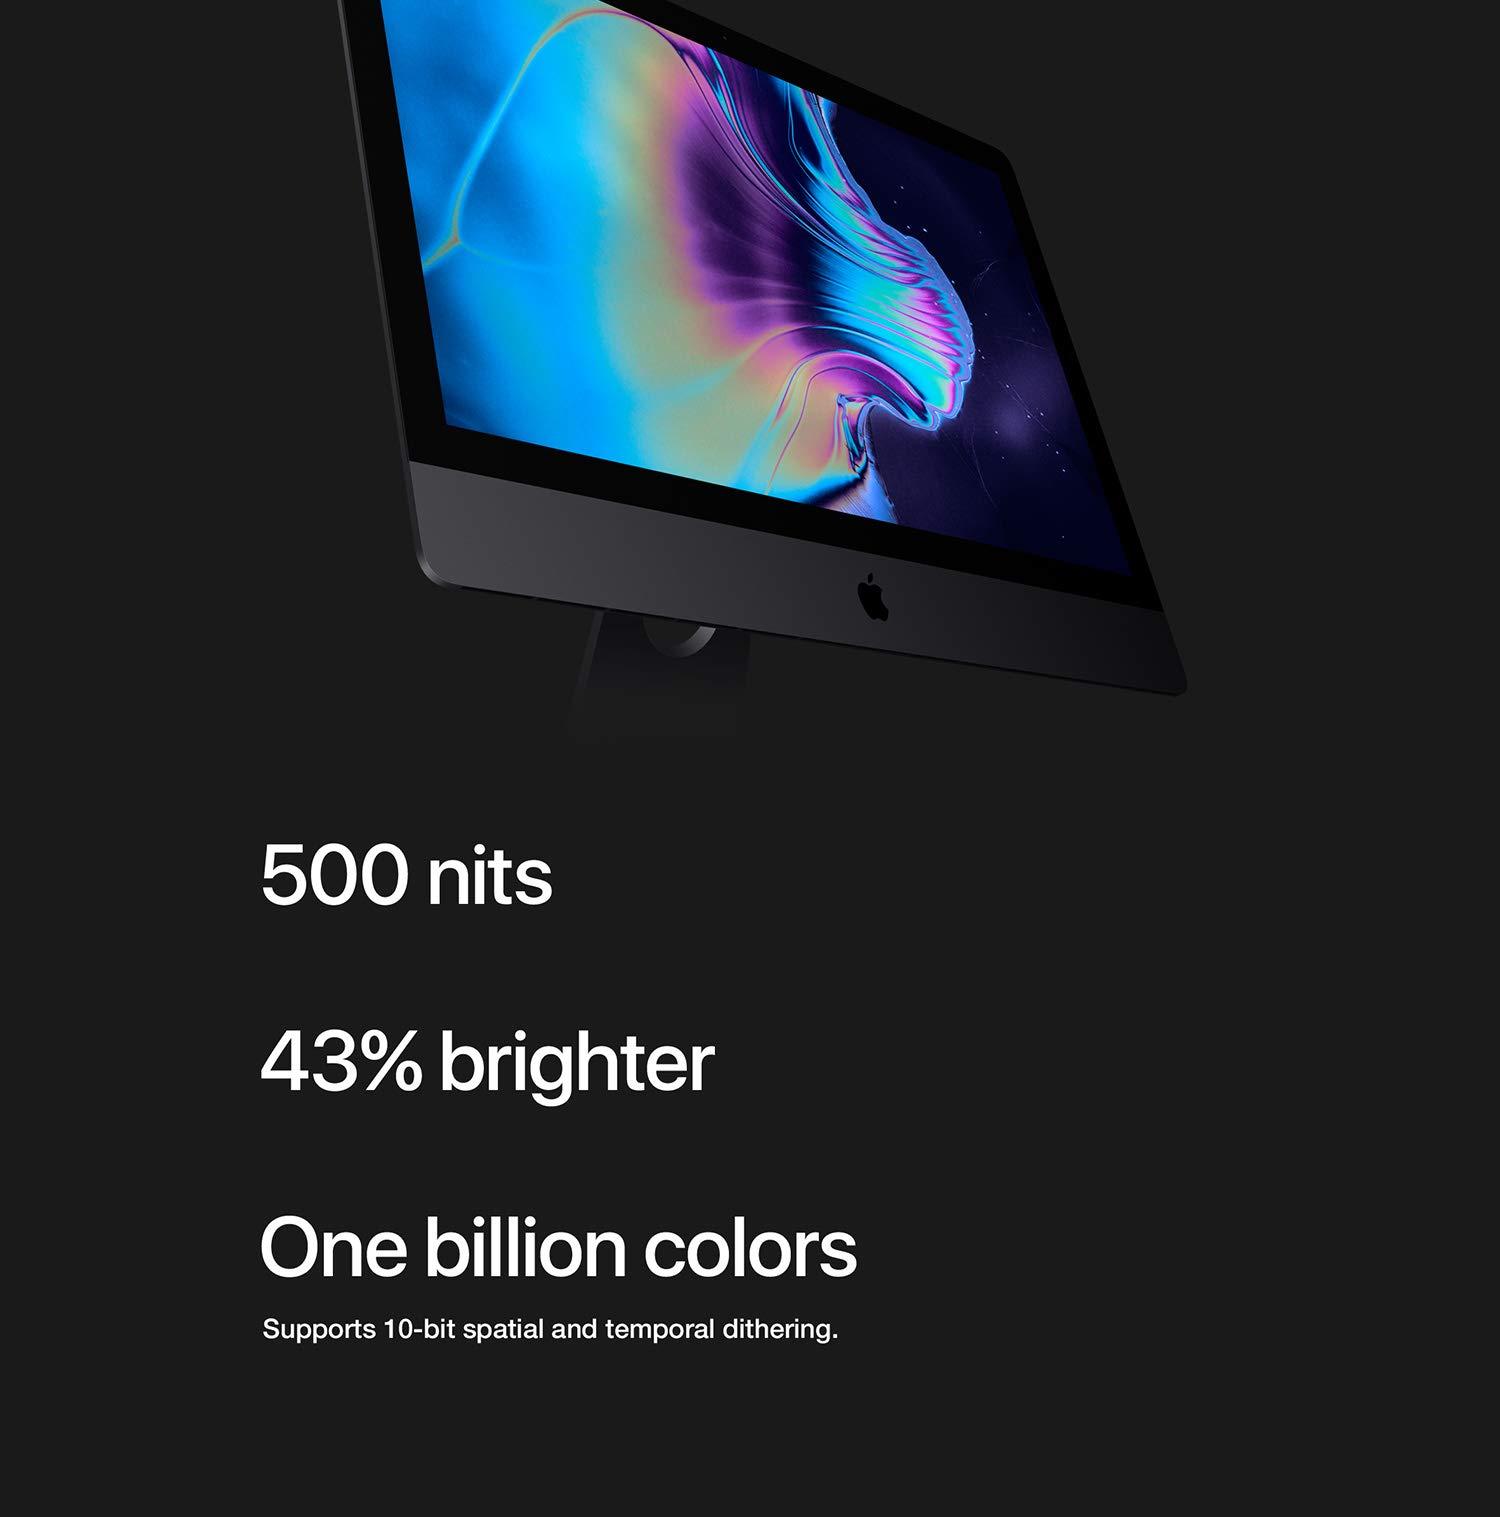 Apple iMac Pro (27-inch with Retina 5K Display, 3 2GHz 8-core Intel Xeon W,  32GB RAM, 1TB SSD) - Space Gray